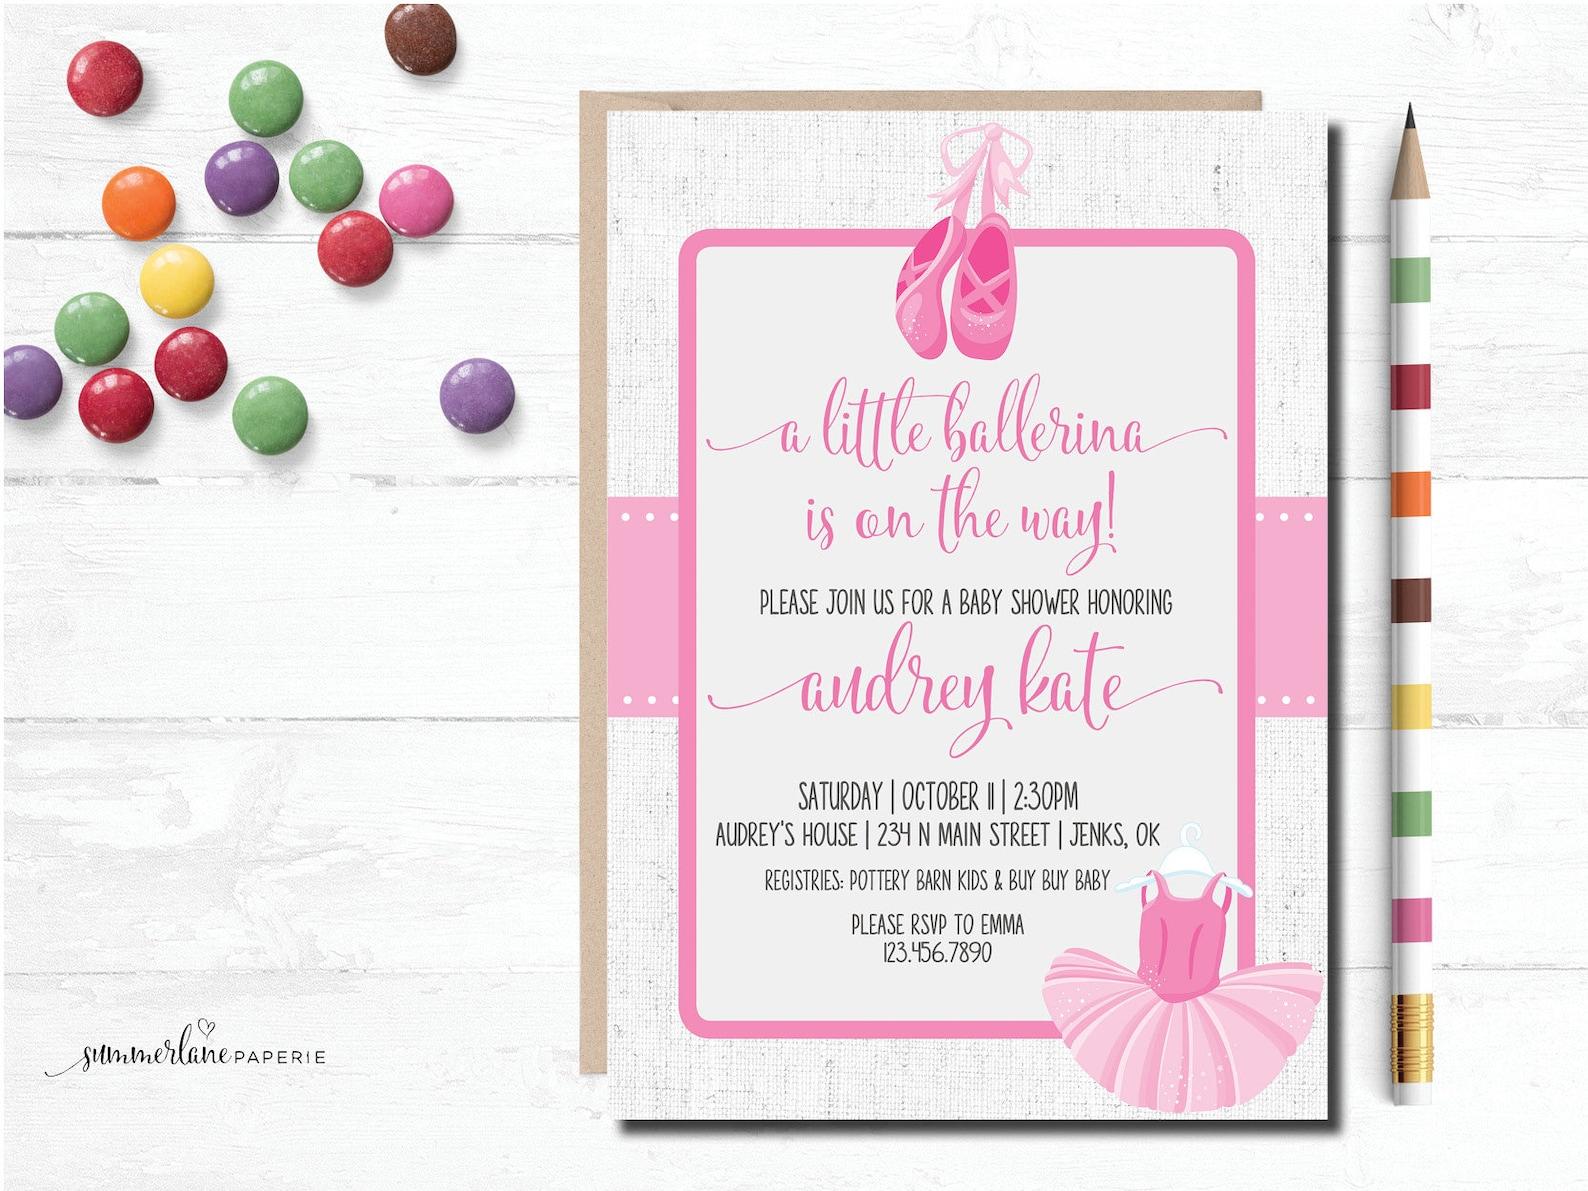 little ballerina baby shower invitations | pink tutu and ballet shoes girl baby shower | classy light pink ballet shower printab